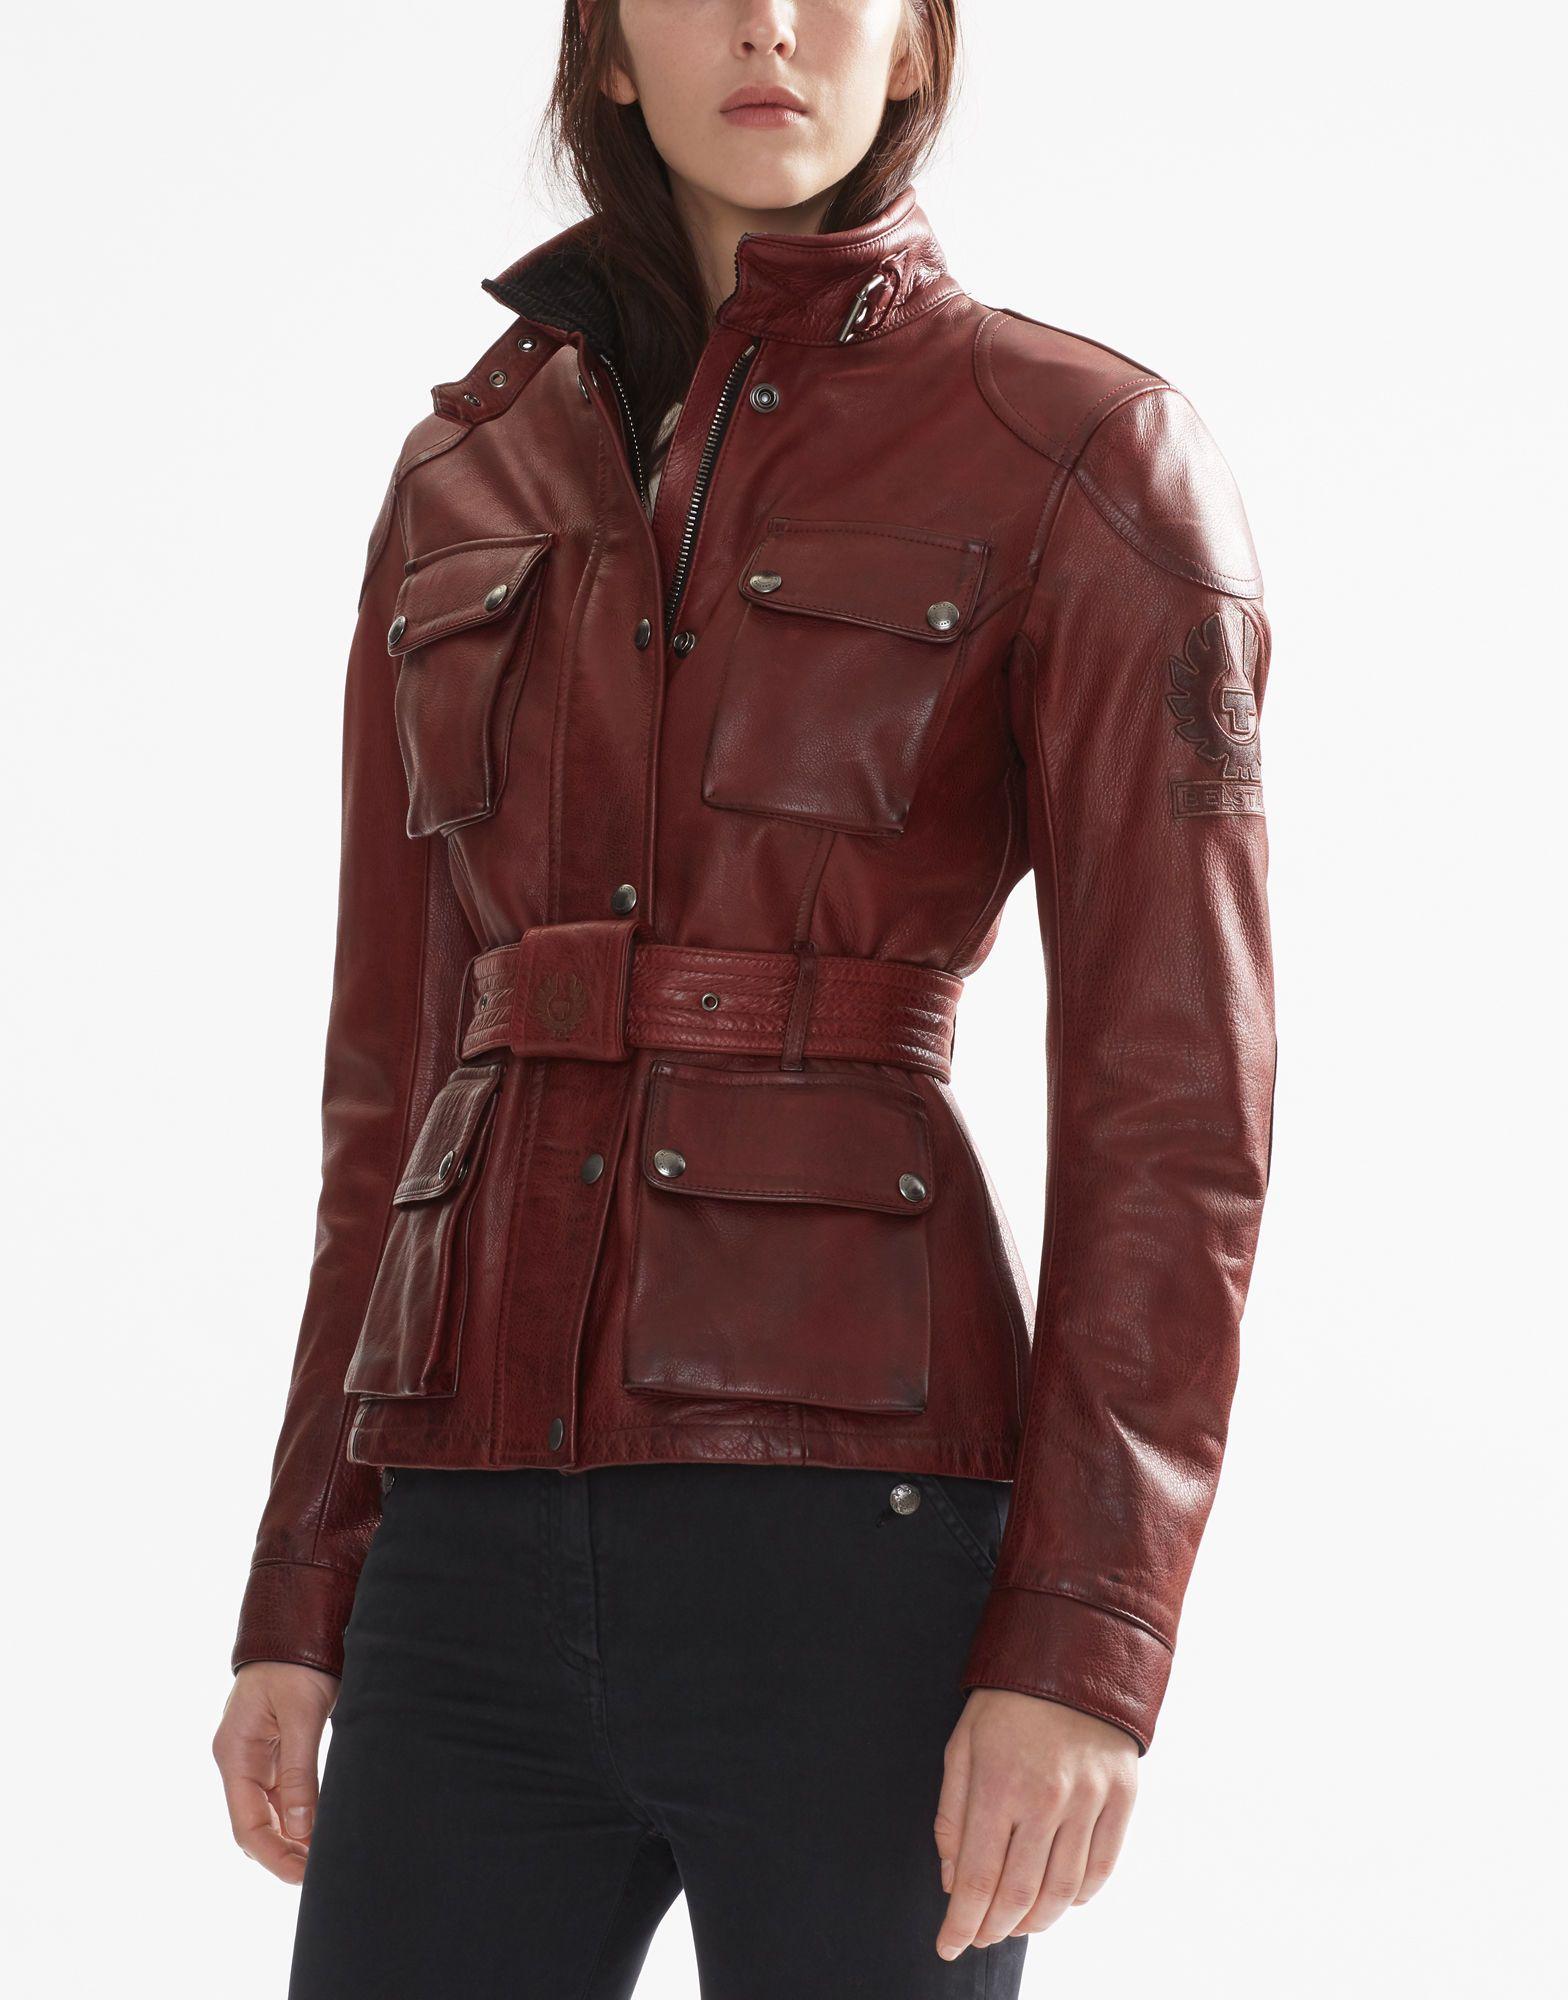 Classic Tourist Trophy Jacket Leather jacket brands